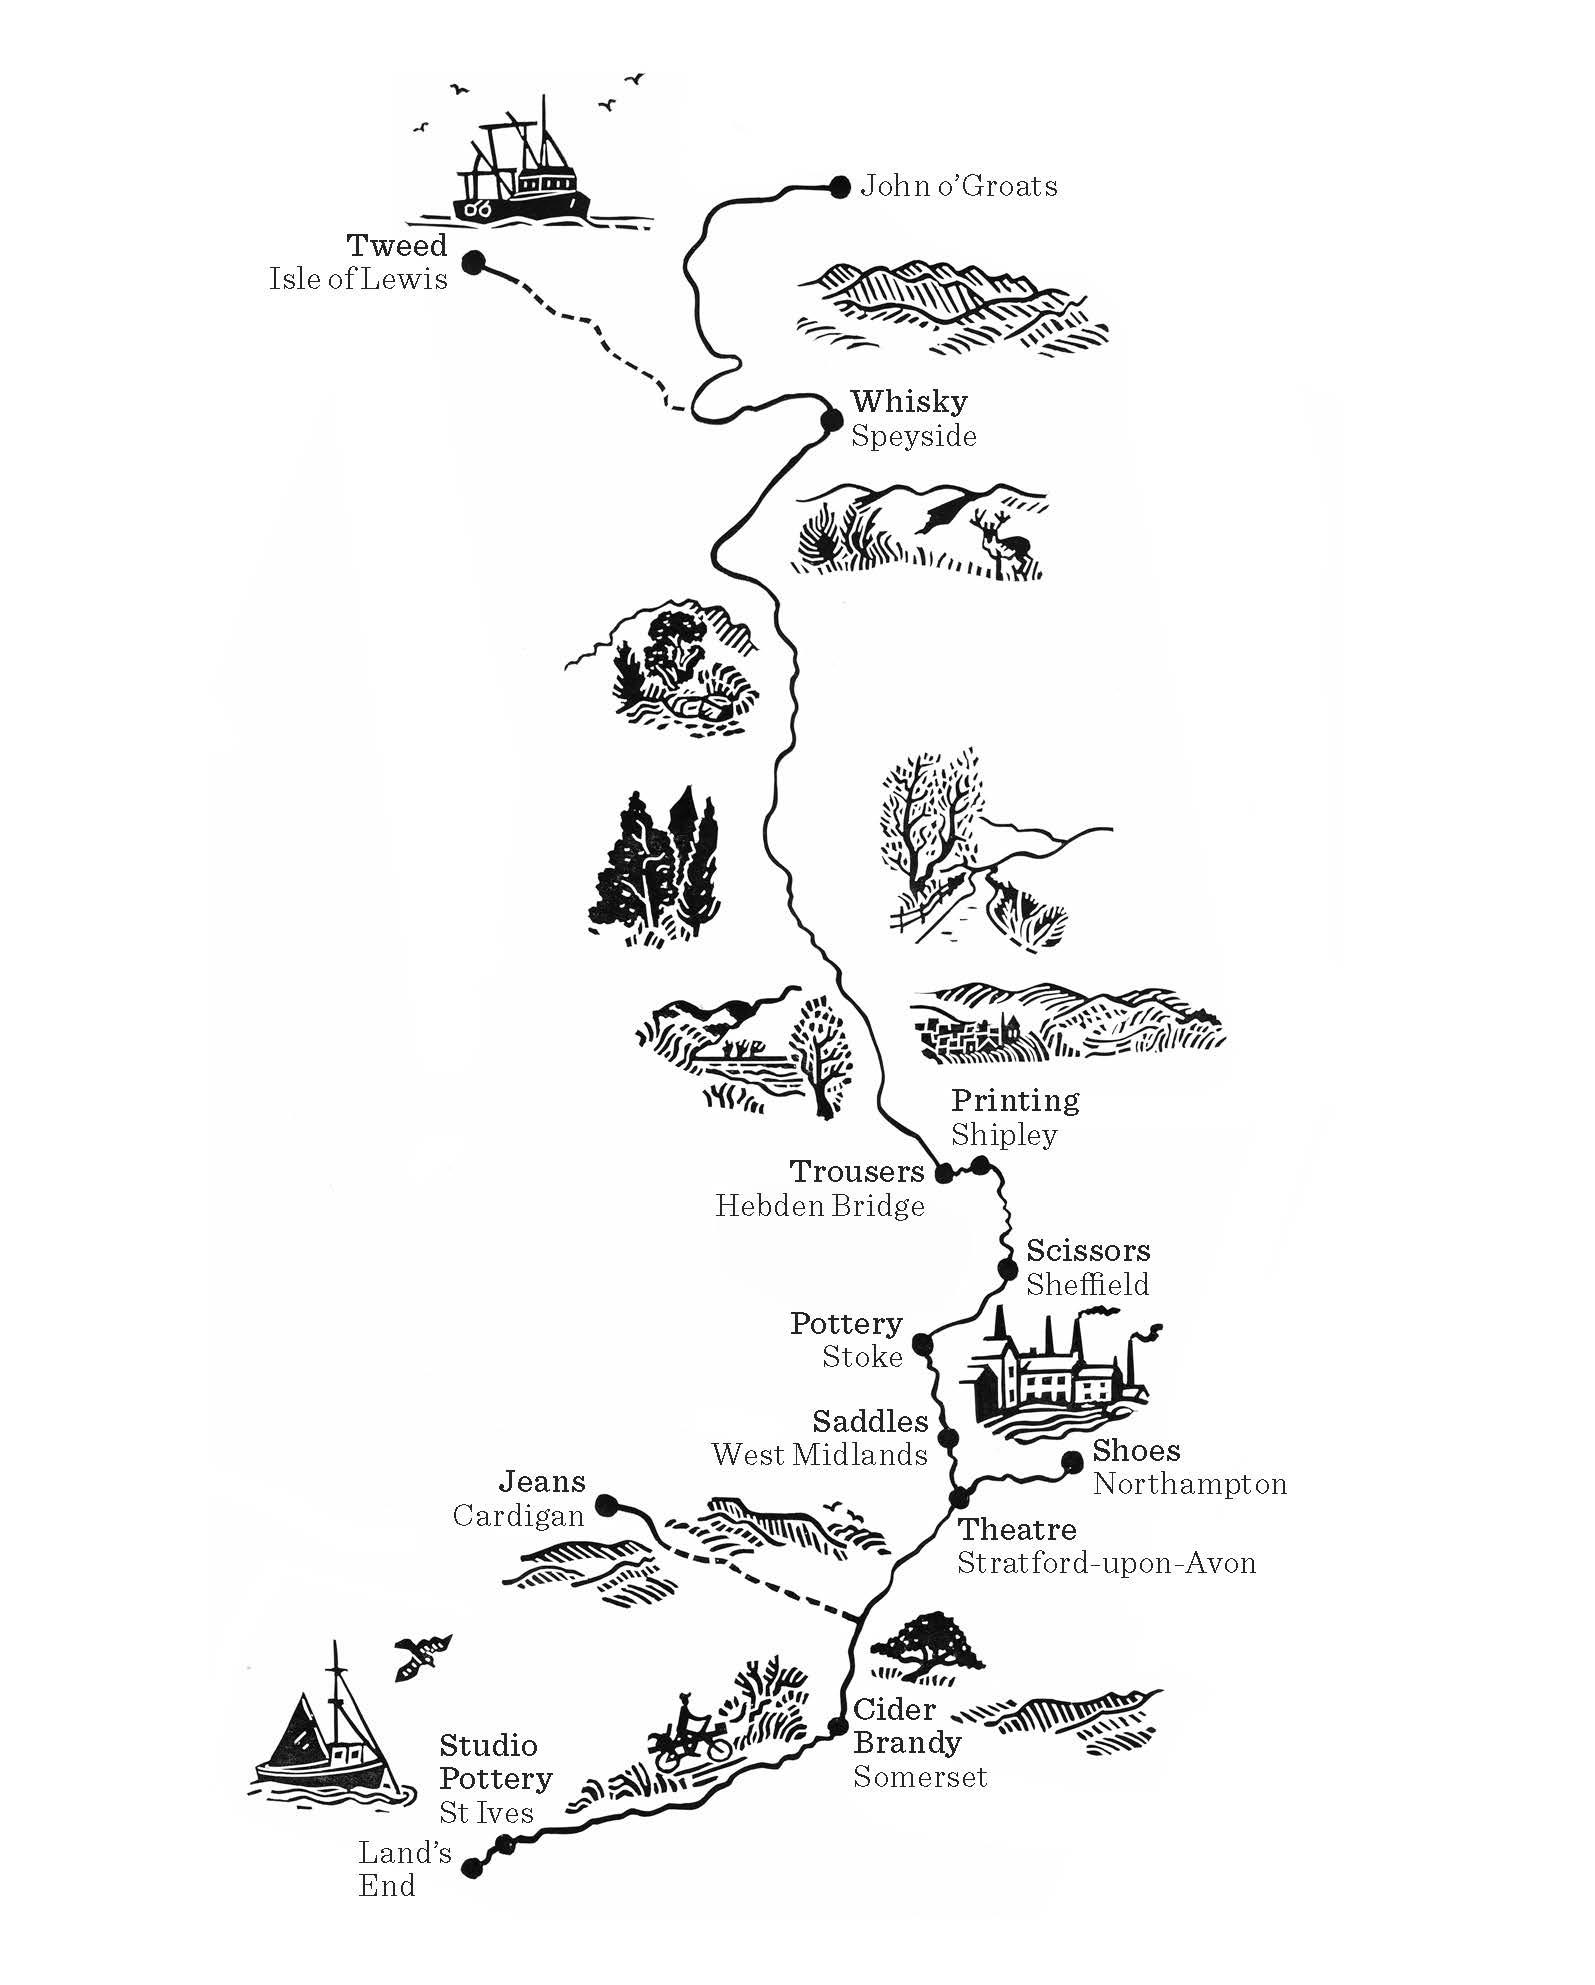 Journeyman_map.jpg